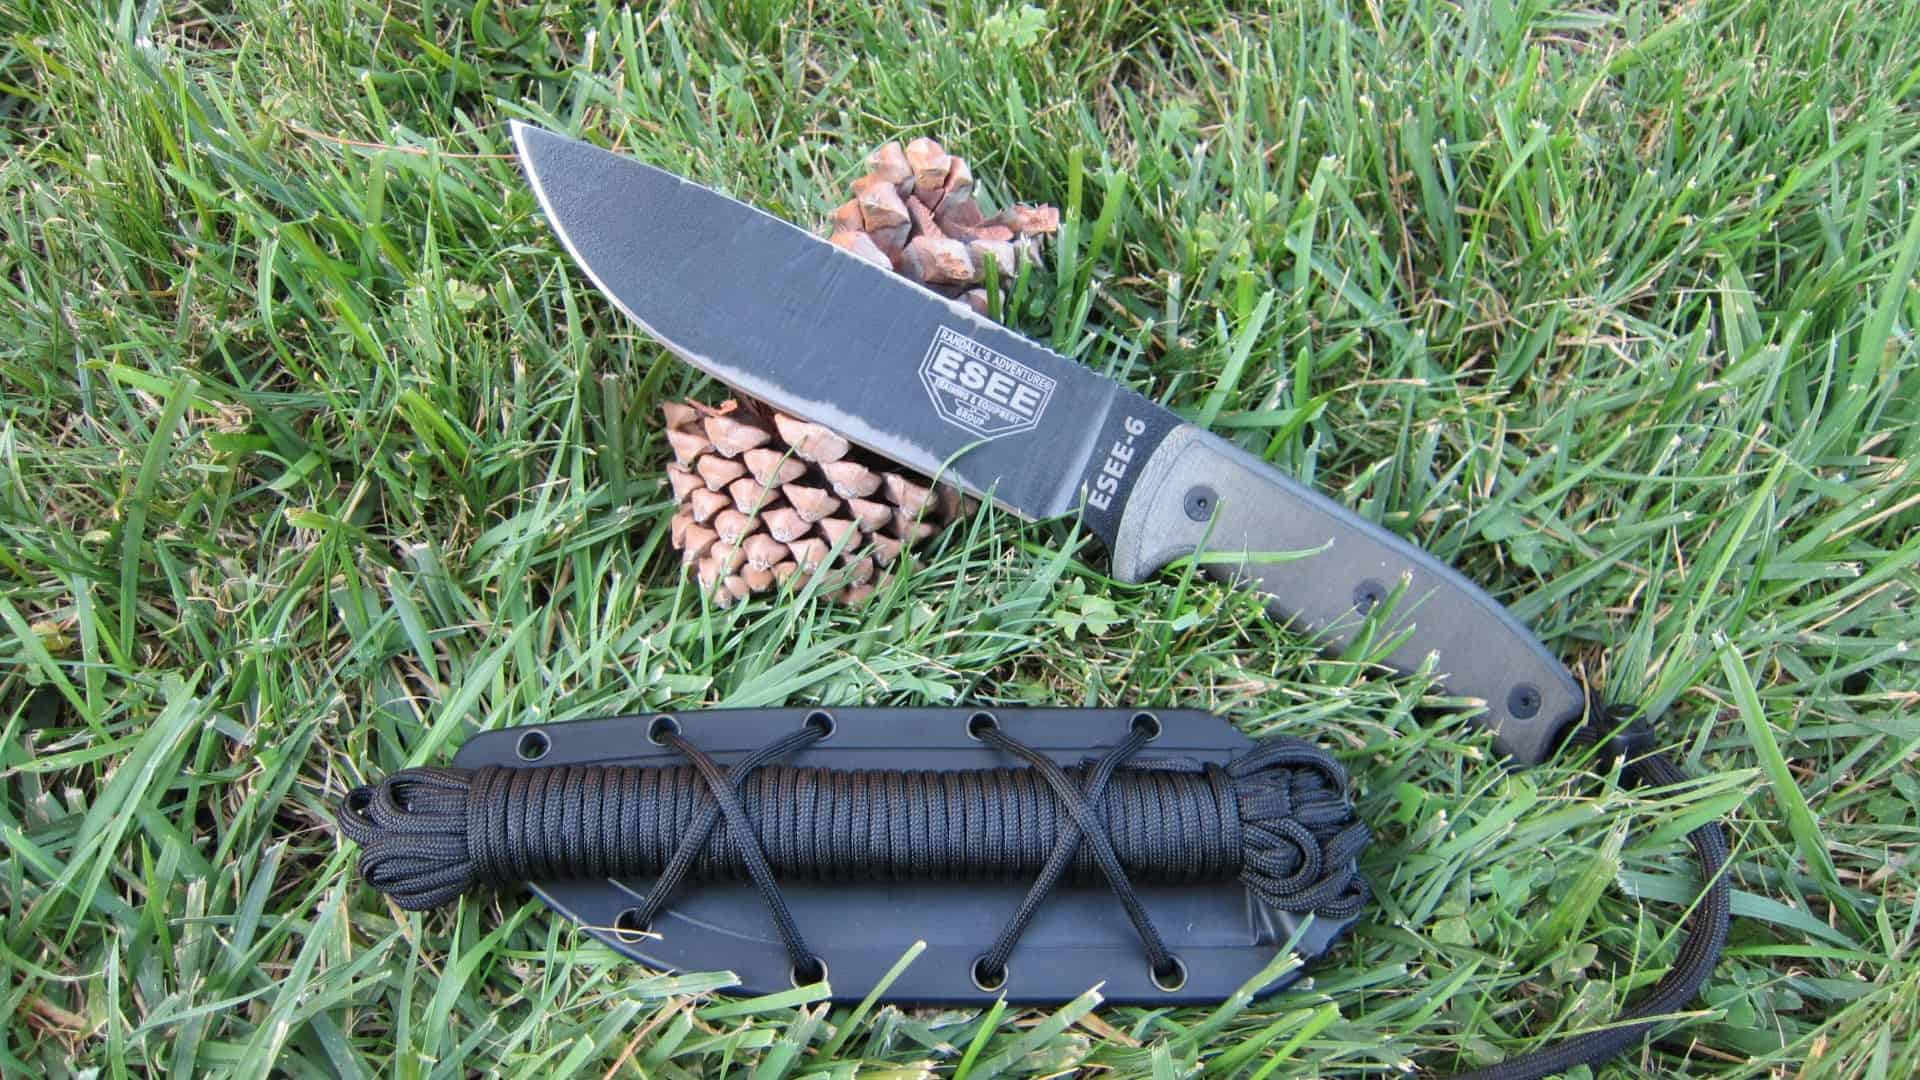 ESEE 6 – bushcraft knife